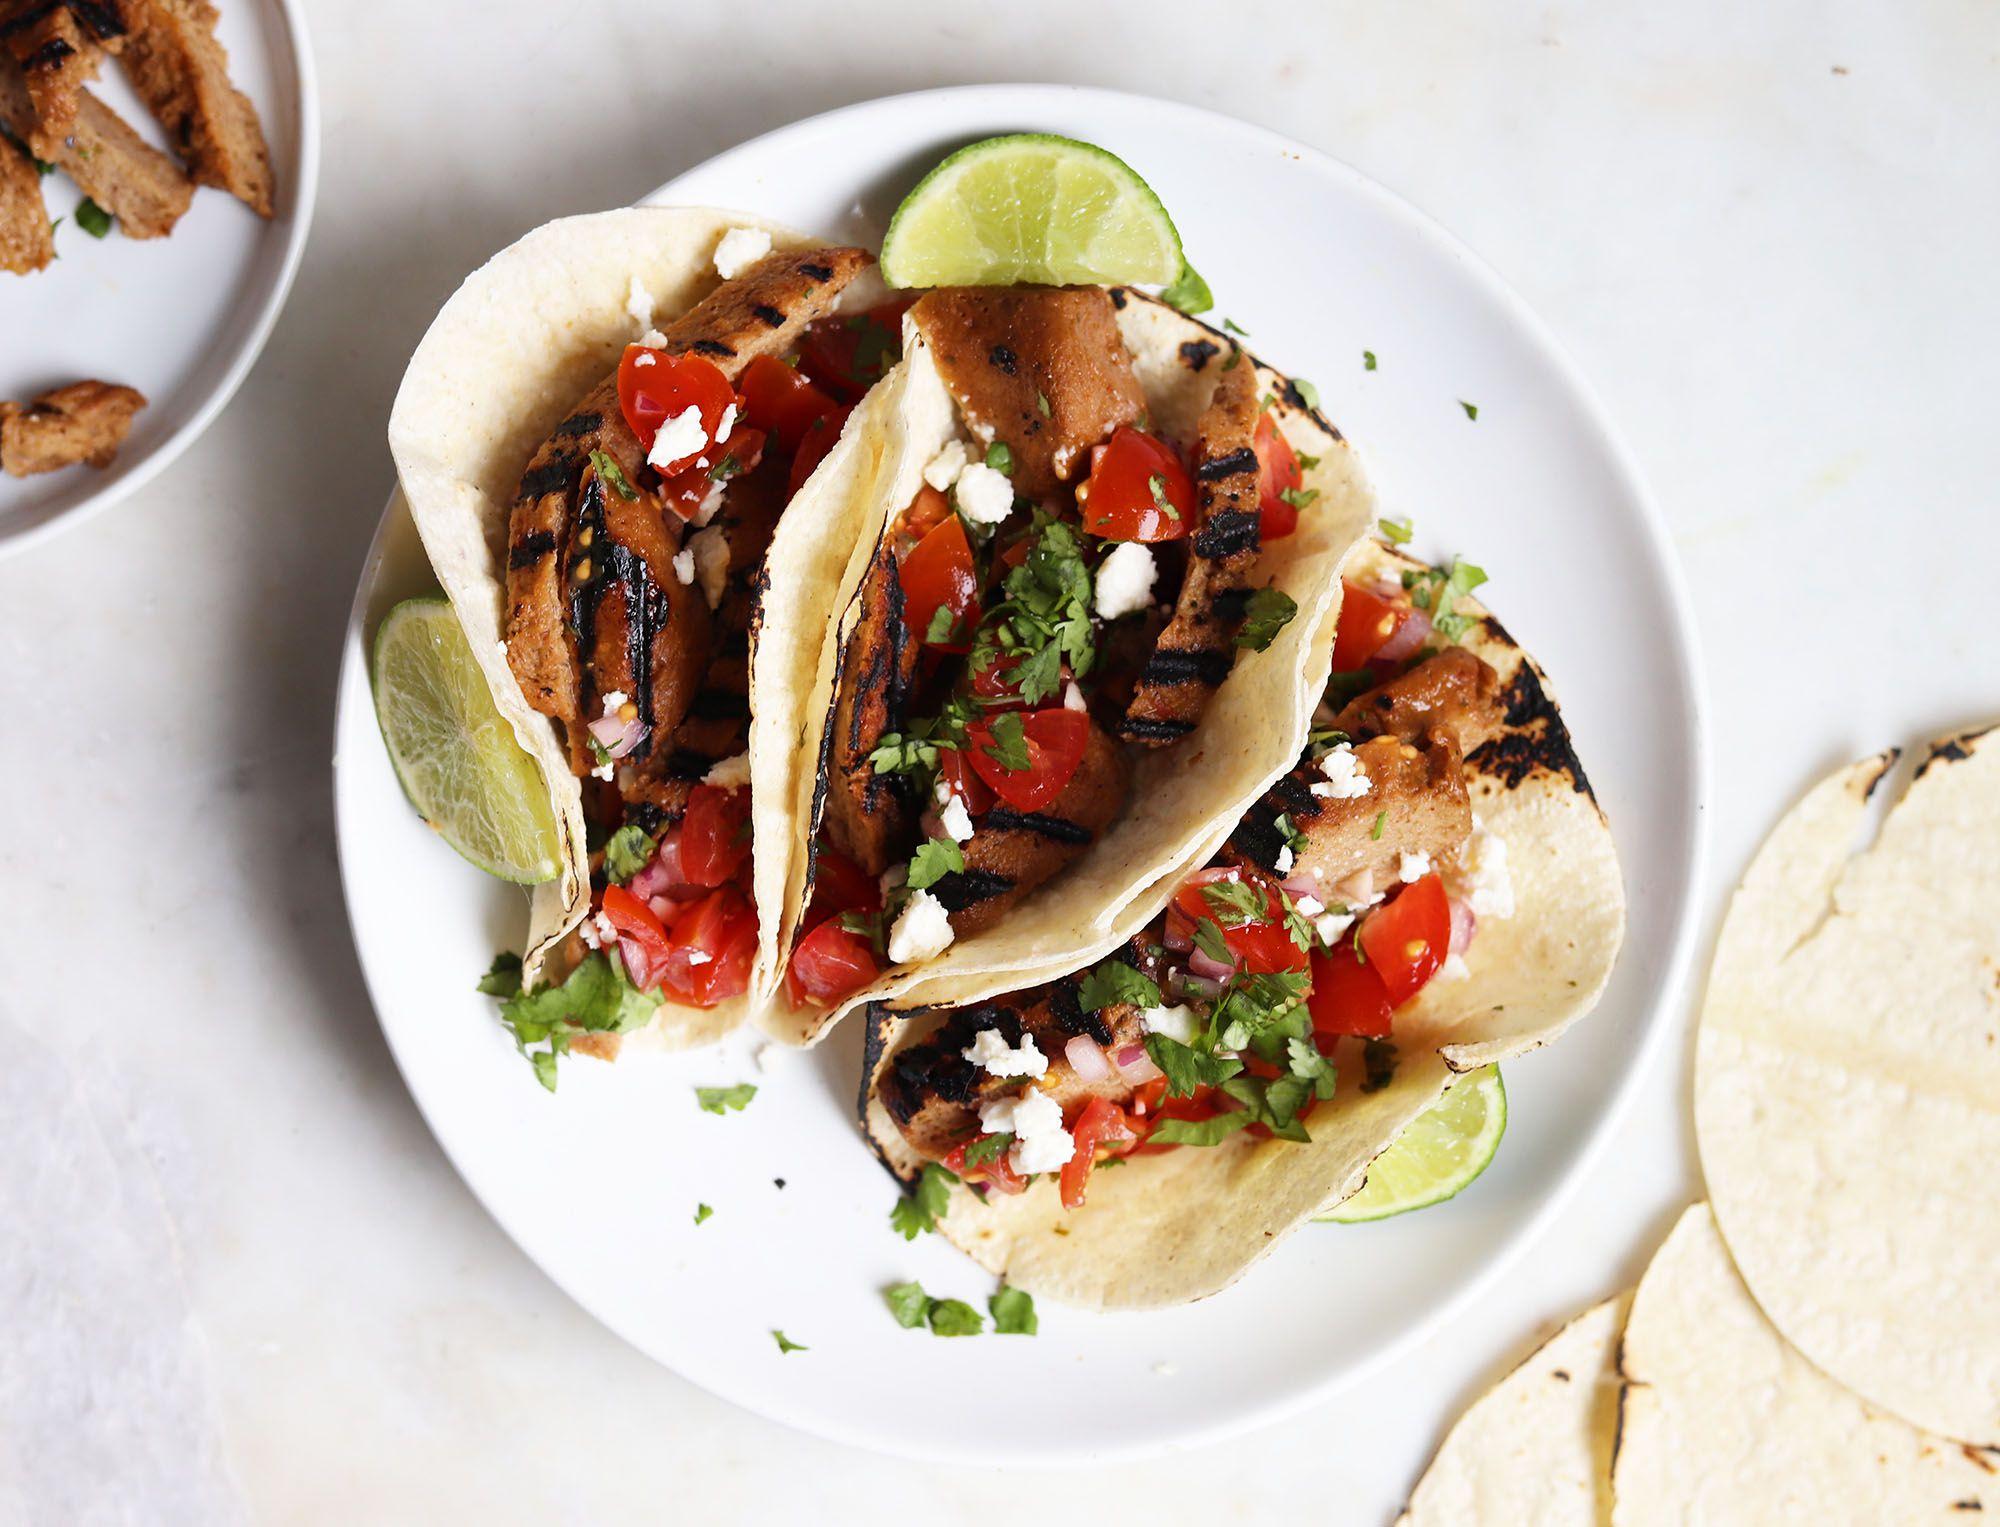 Seitan Takes These Carne Asada Tacos to the Vegan Side